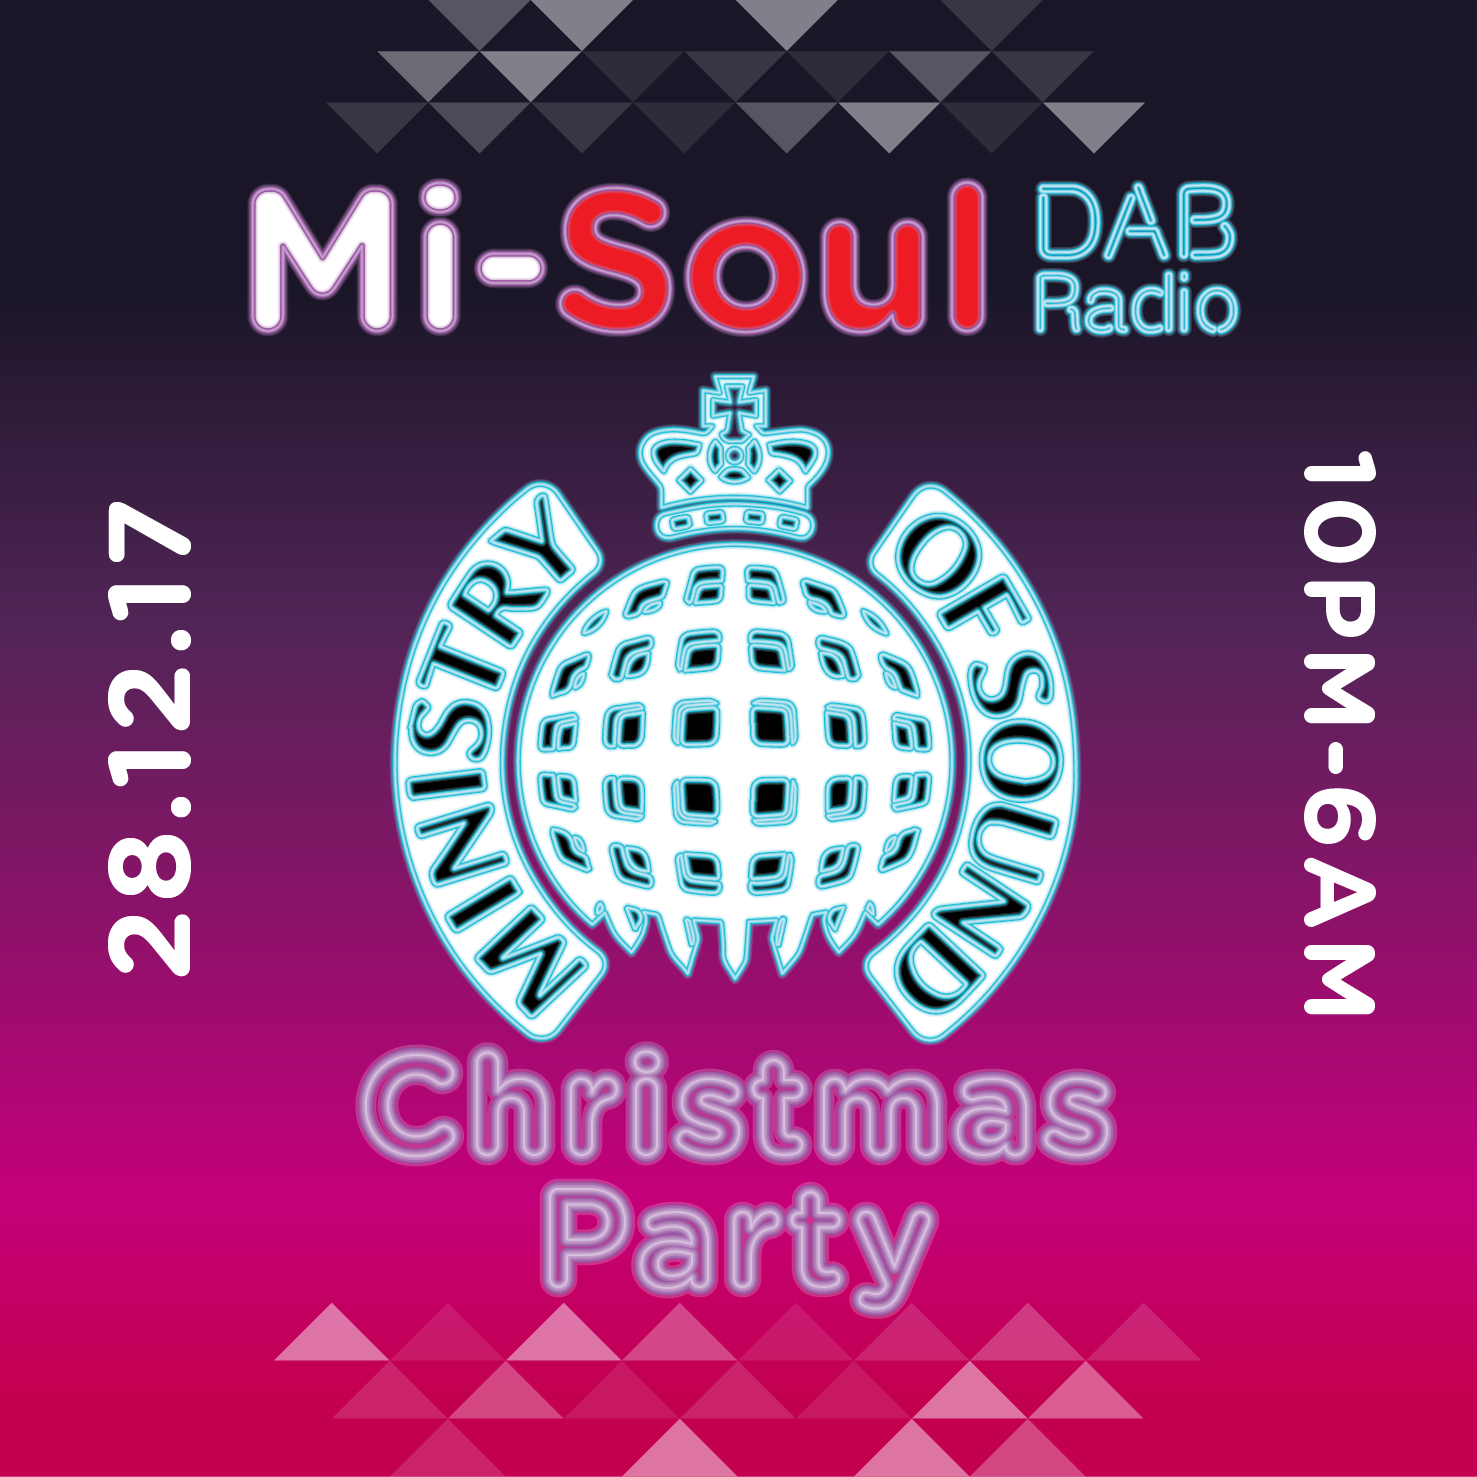 Mi-Soul Christmas Party